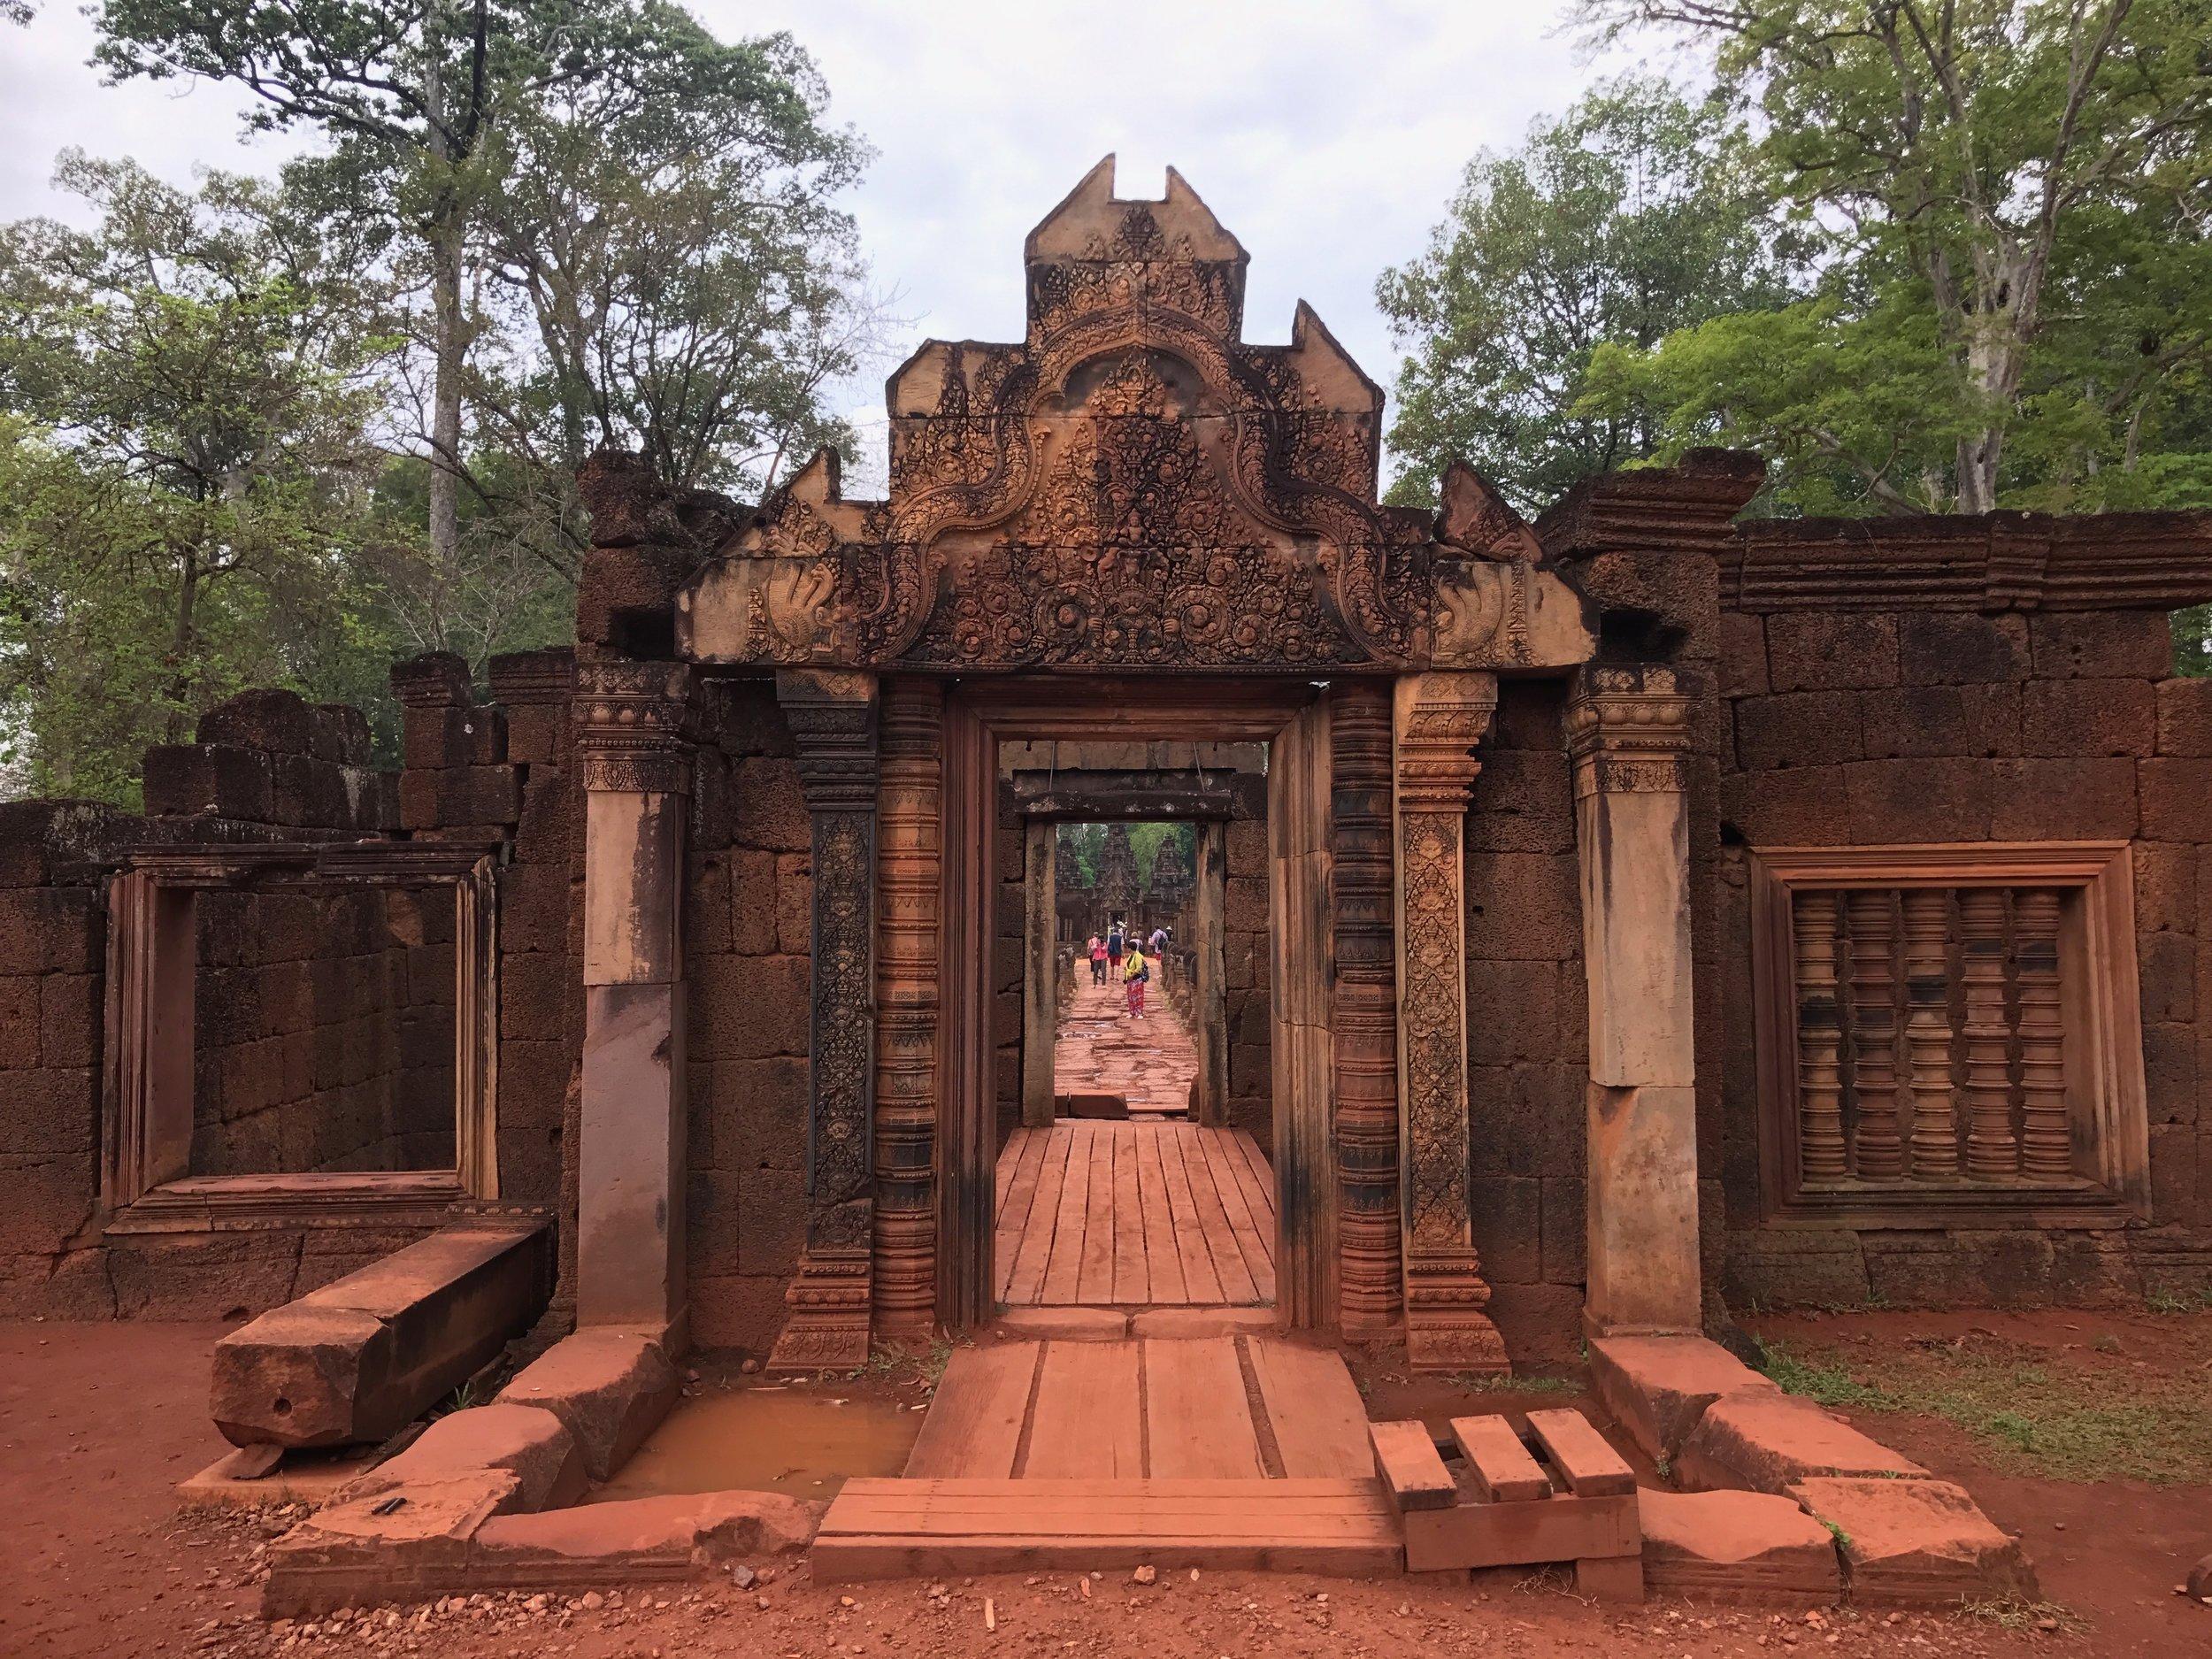 Banteay Srei Angkor Wat Cambodia